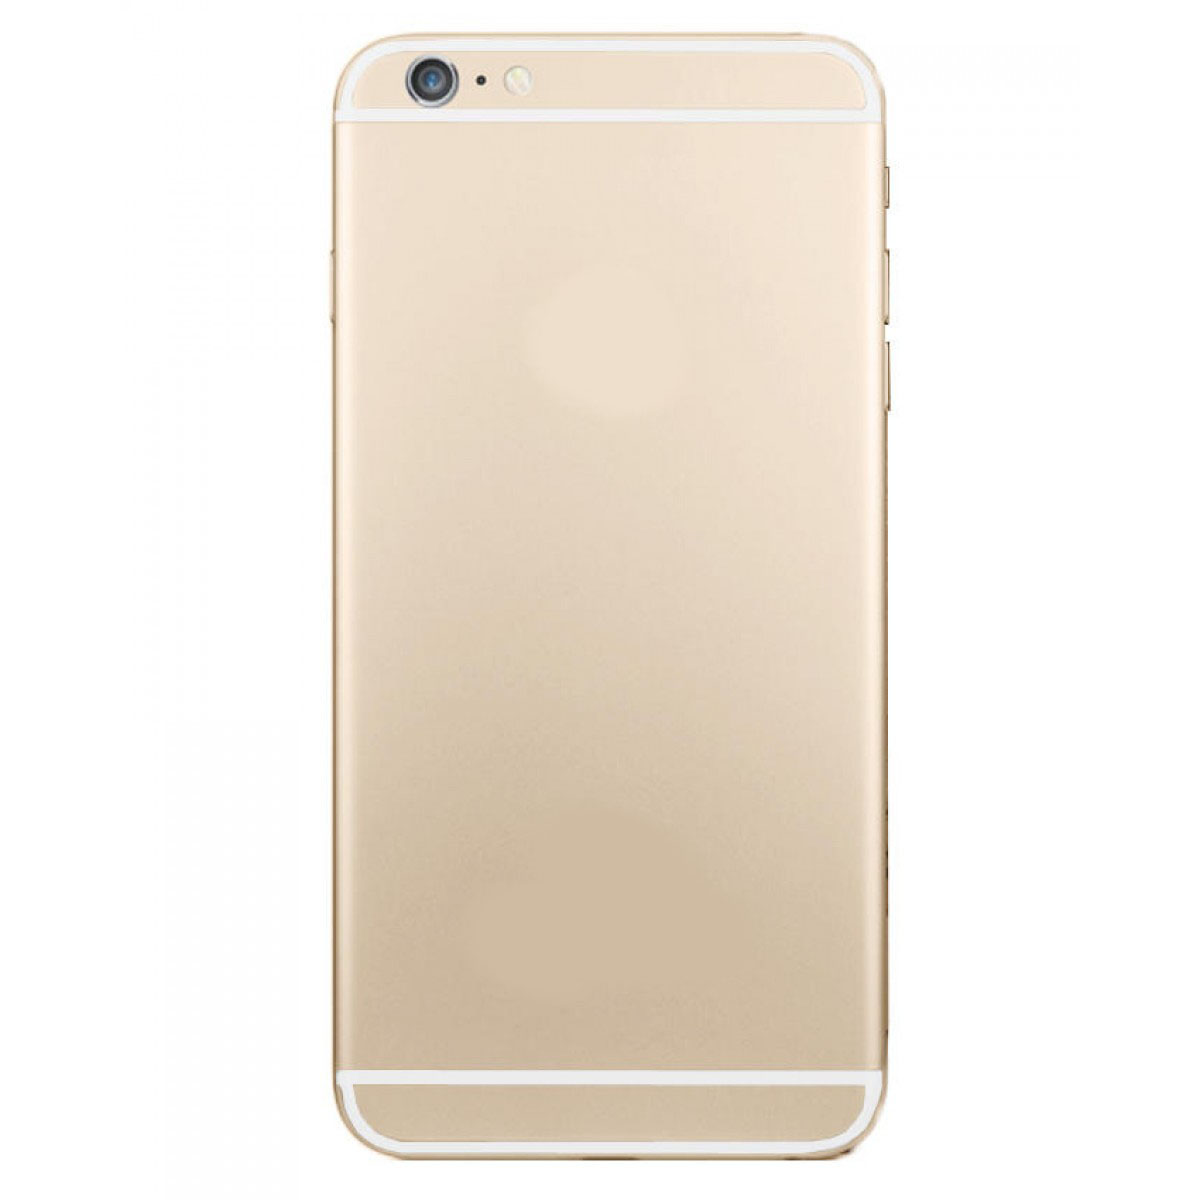 back cover apple iphone 6 gold without logo fixmobile store. Black Bedroom Furniture Sets. Home Design Ideas